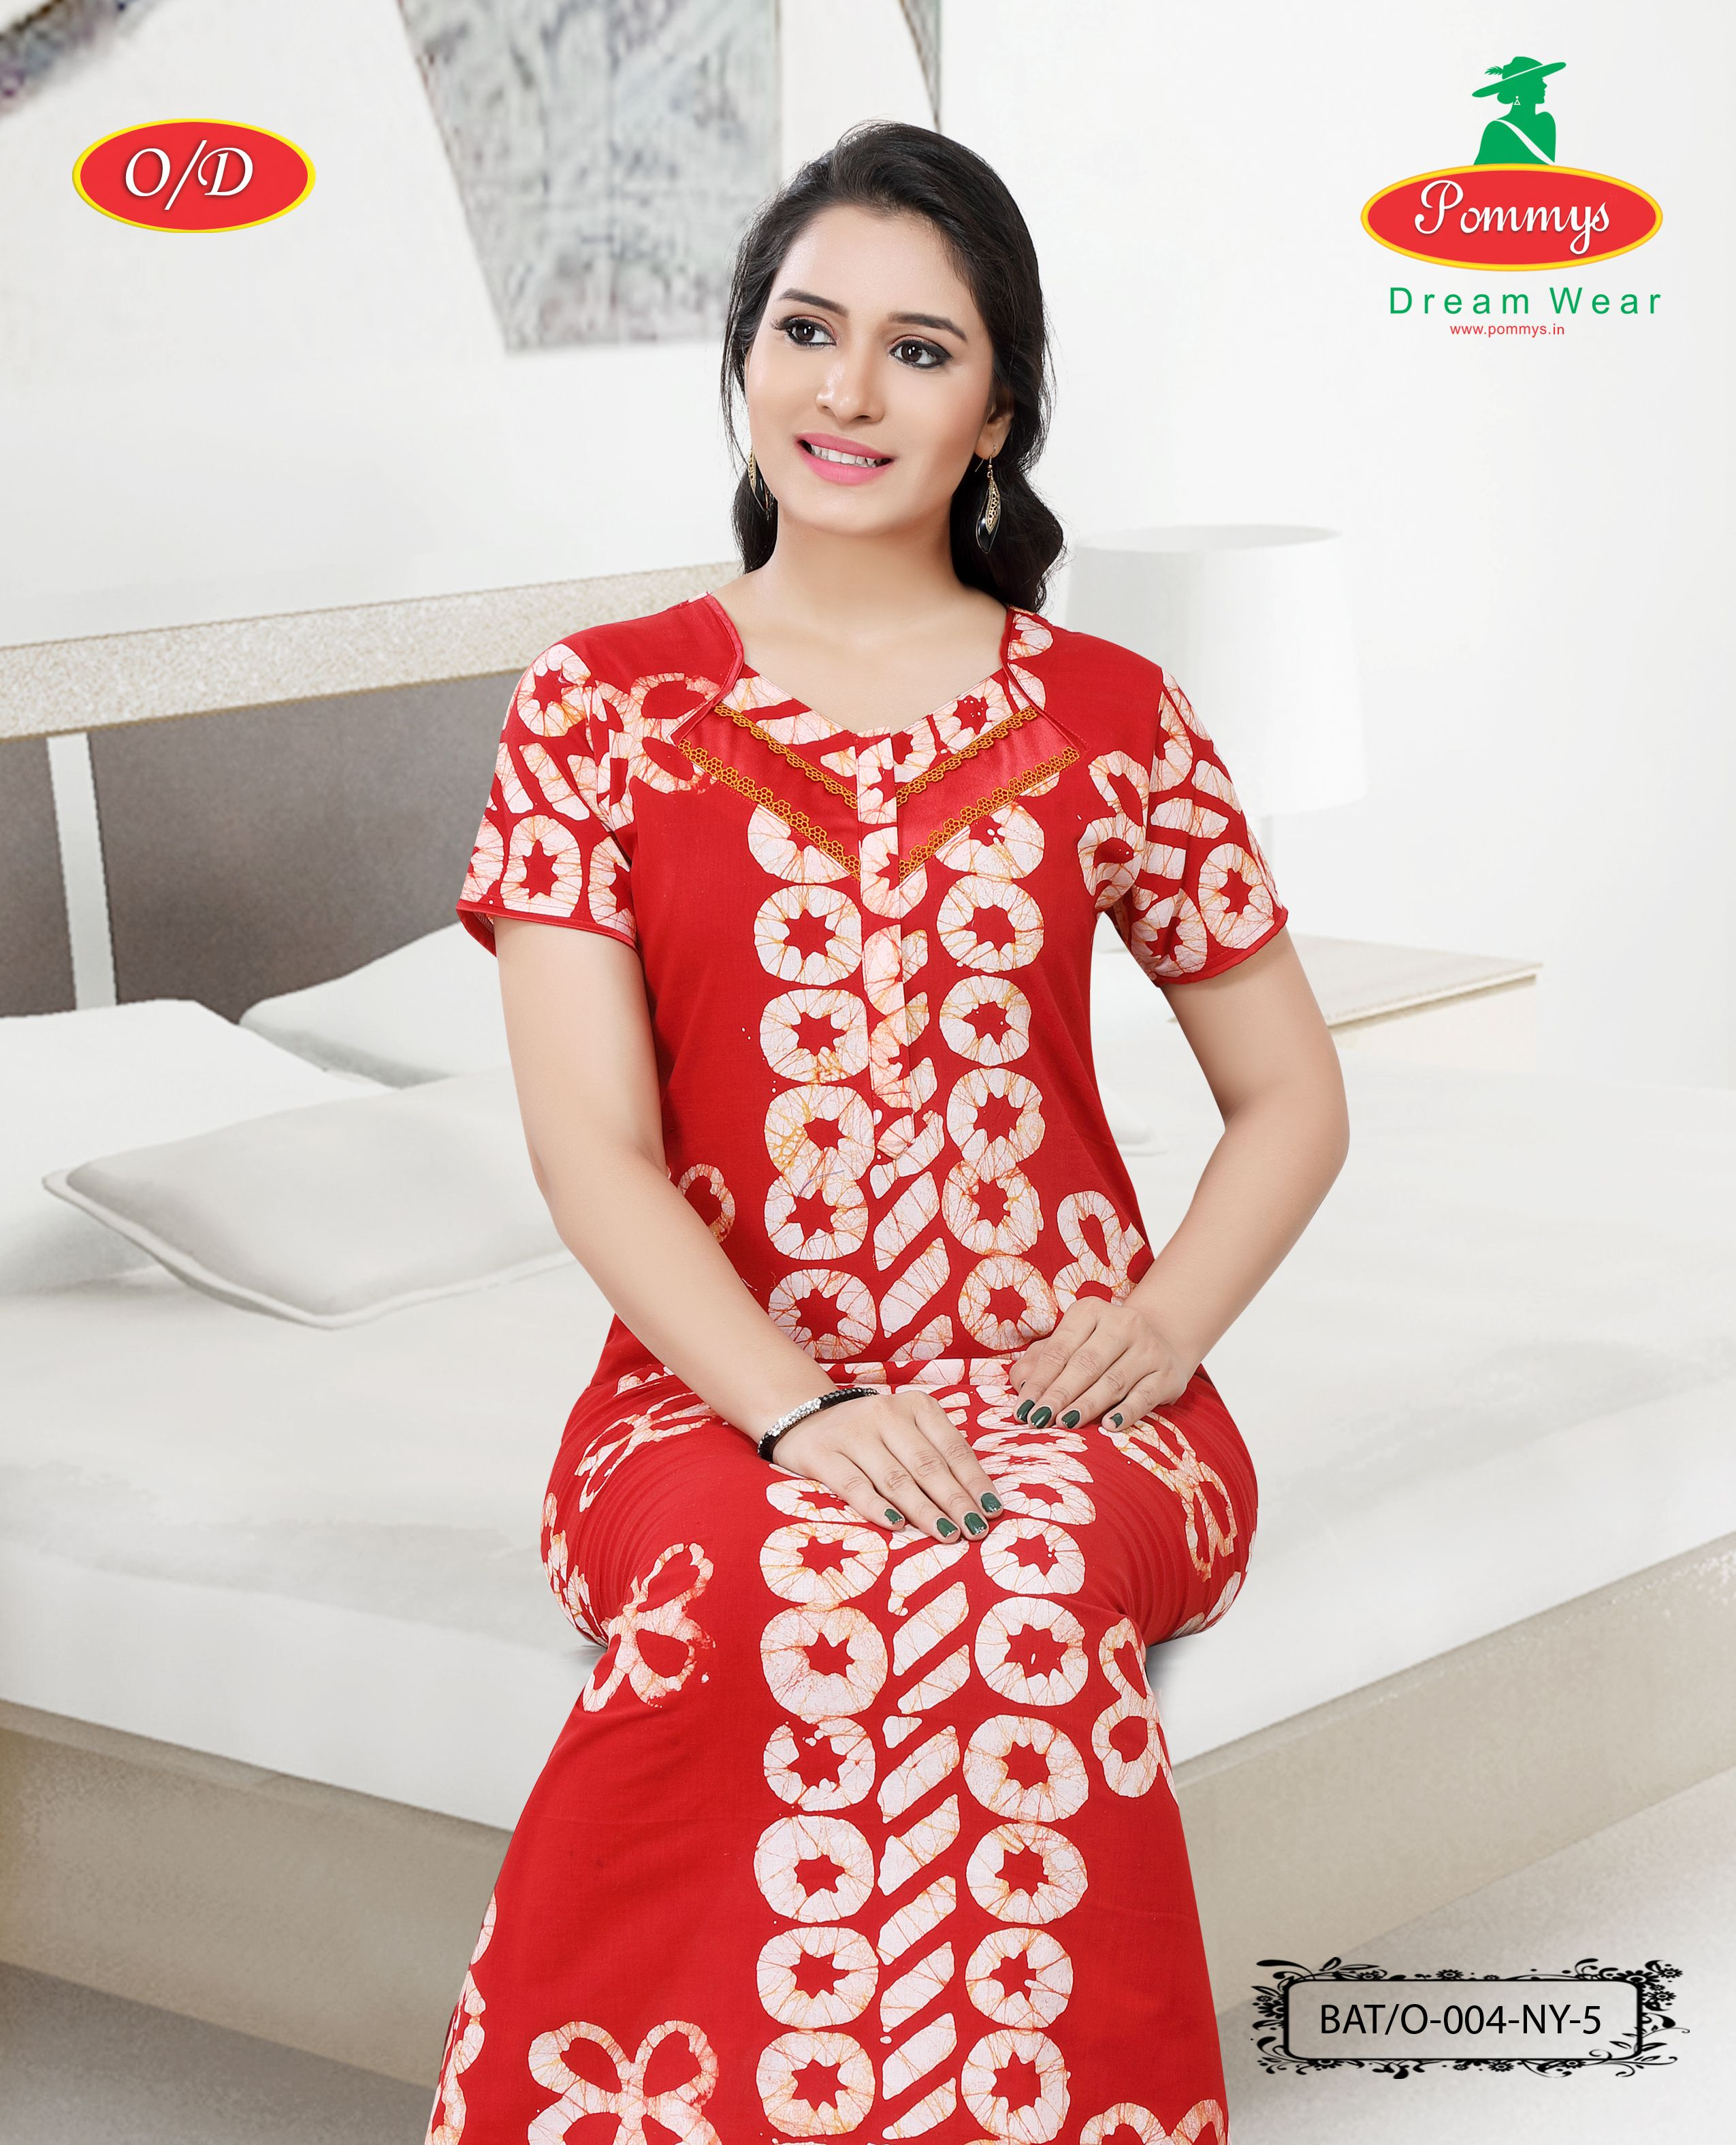 Red Nighty Indian Gown Women/'s Soft Cotton NightyNightwearNight DressSleepwear  Cotton Nighty For Women Fabric Craft For Girls